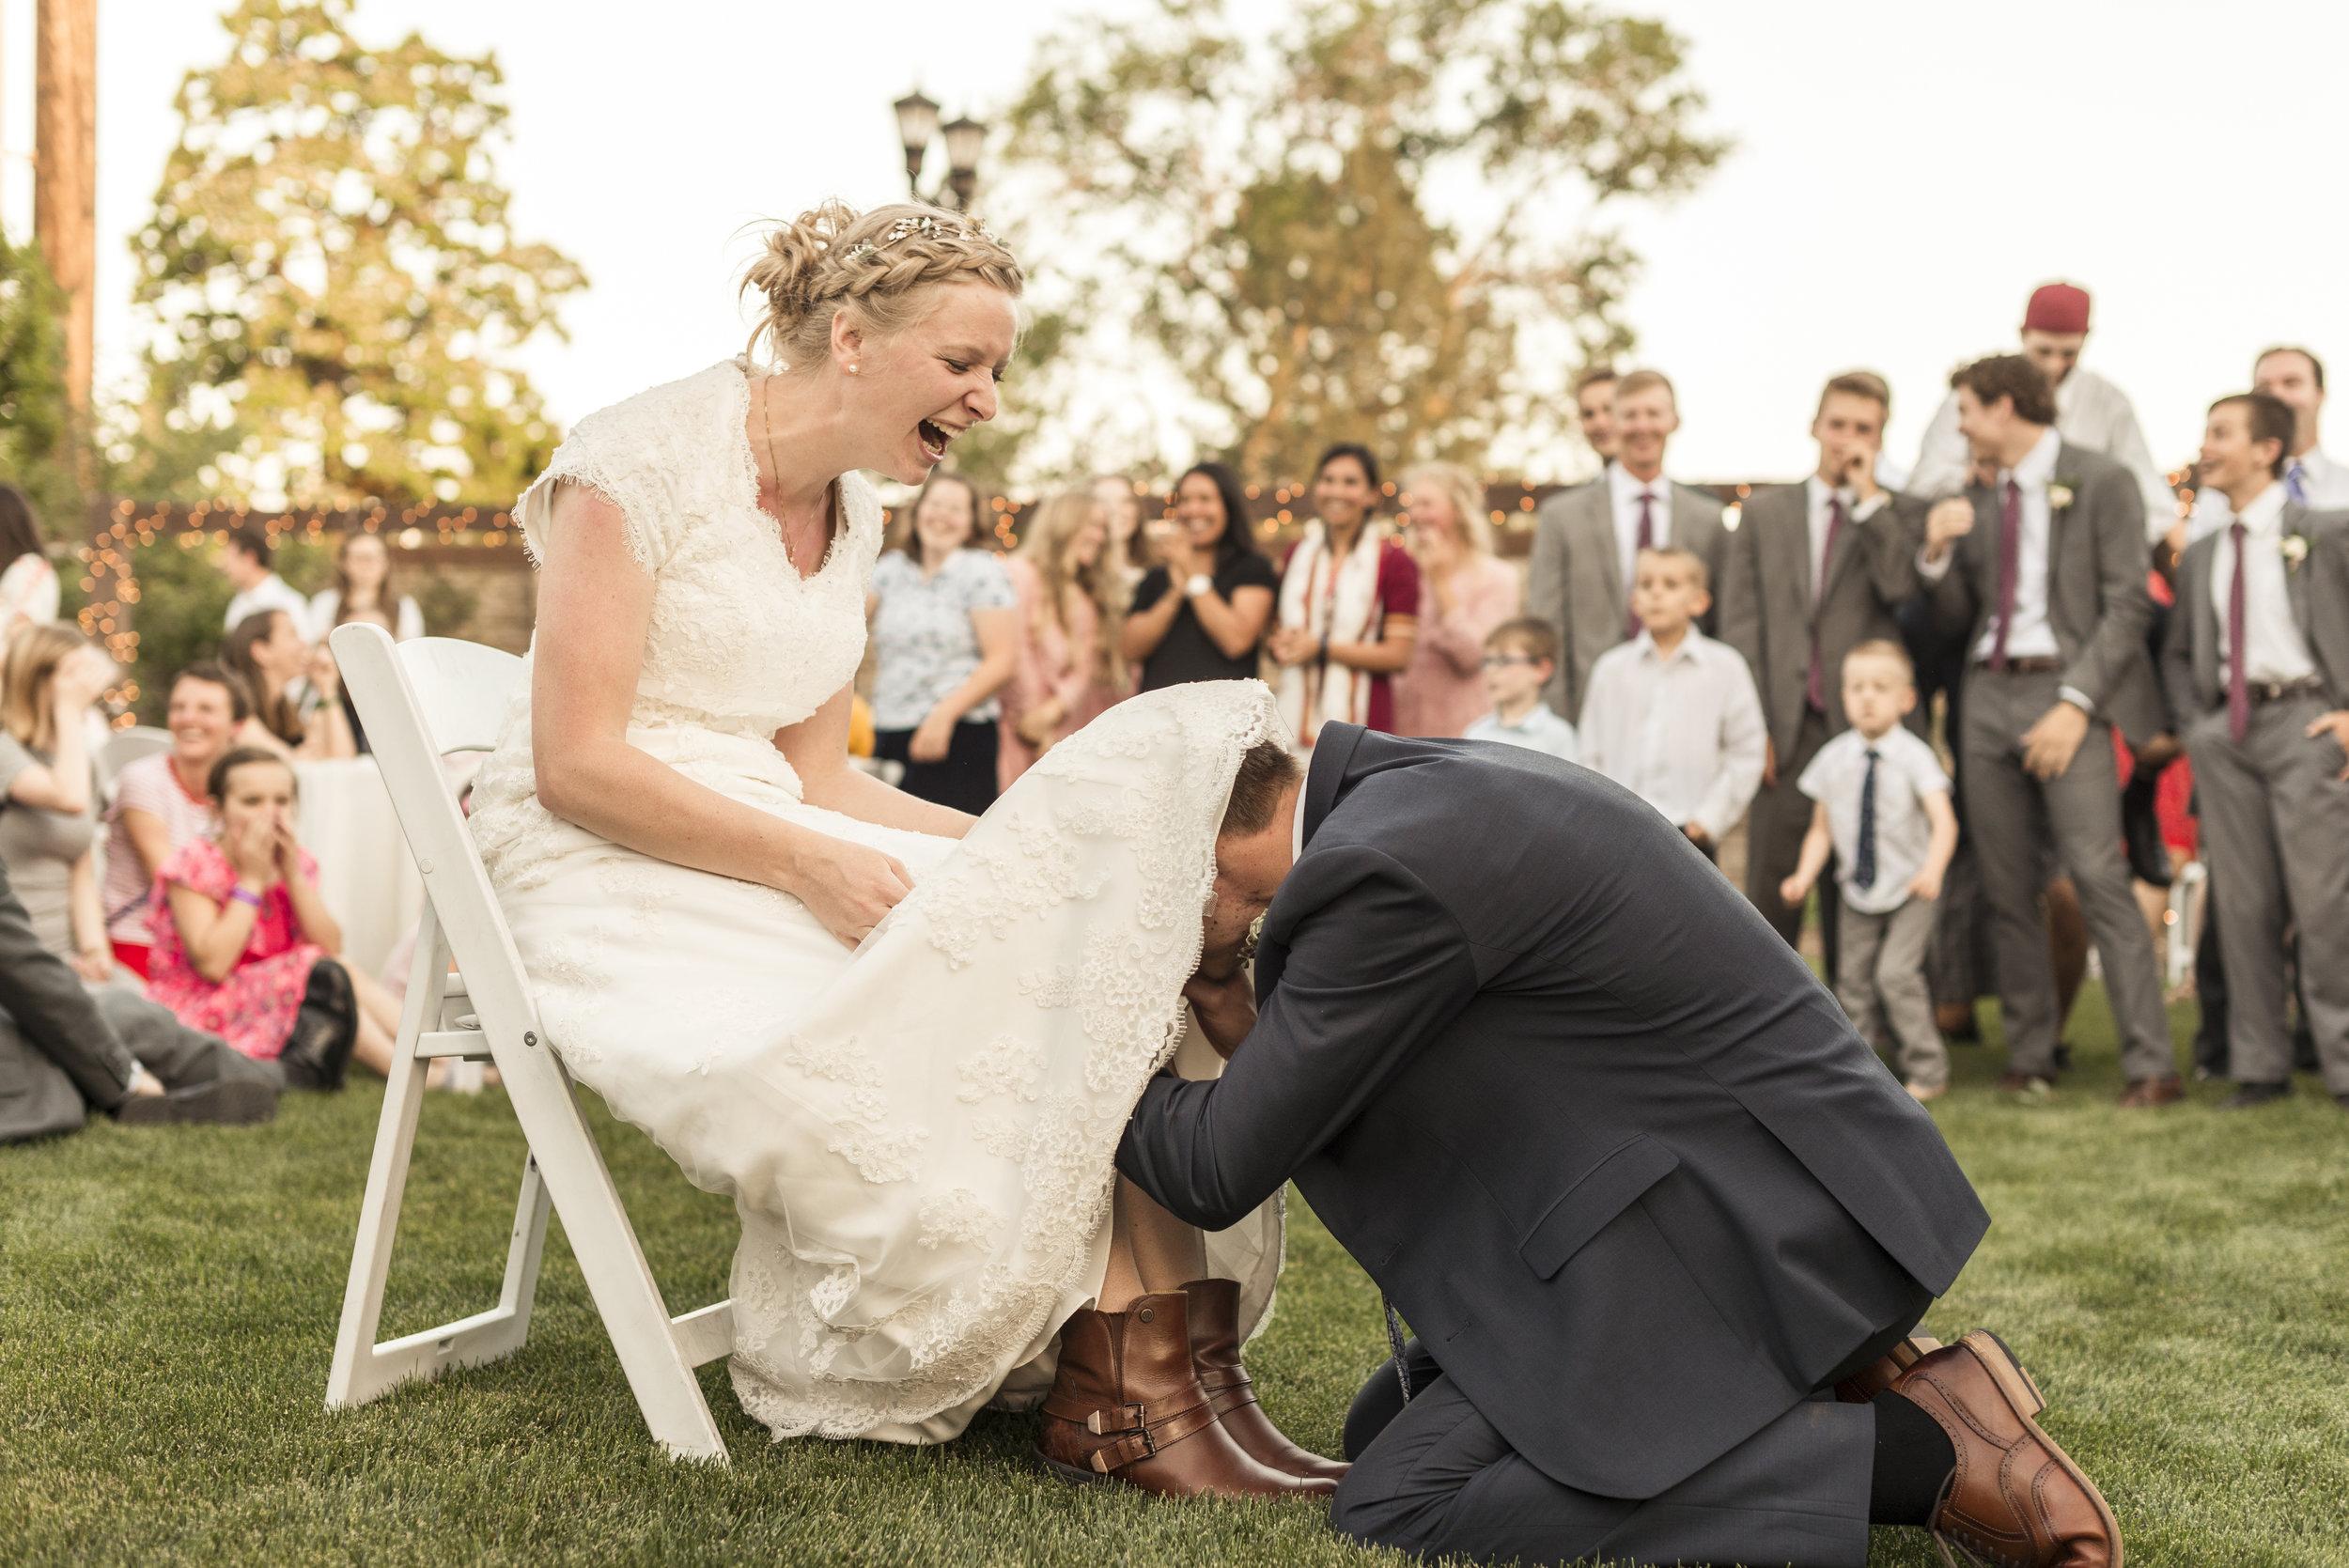 LDS Summer Wedding | South Jordan, Utah Wedding Photographer| Bri Bergman Photography 26.JPG